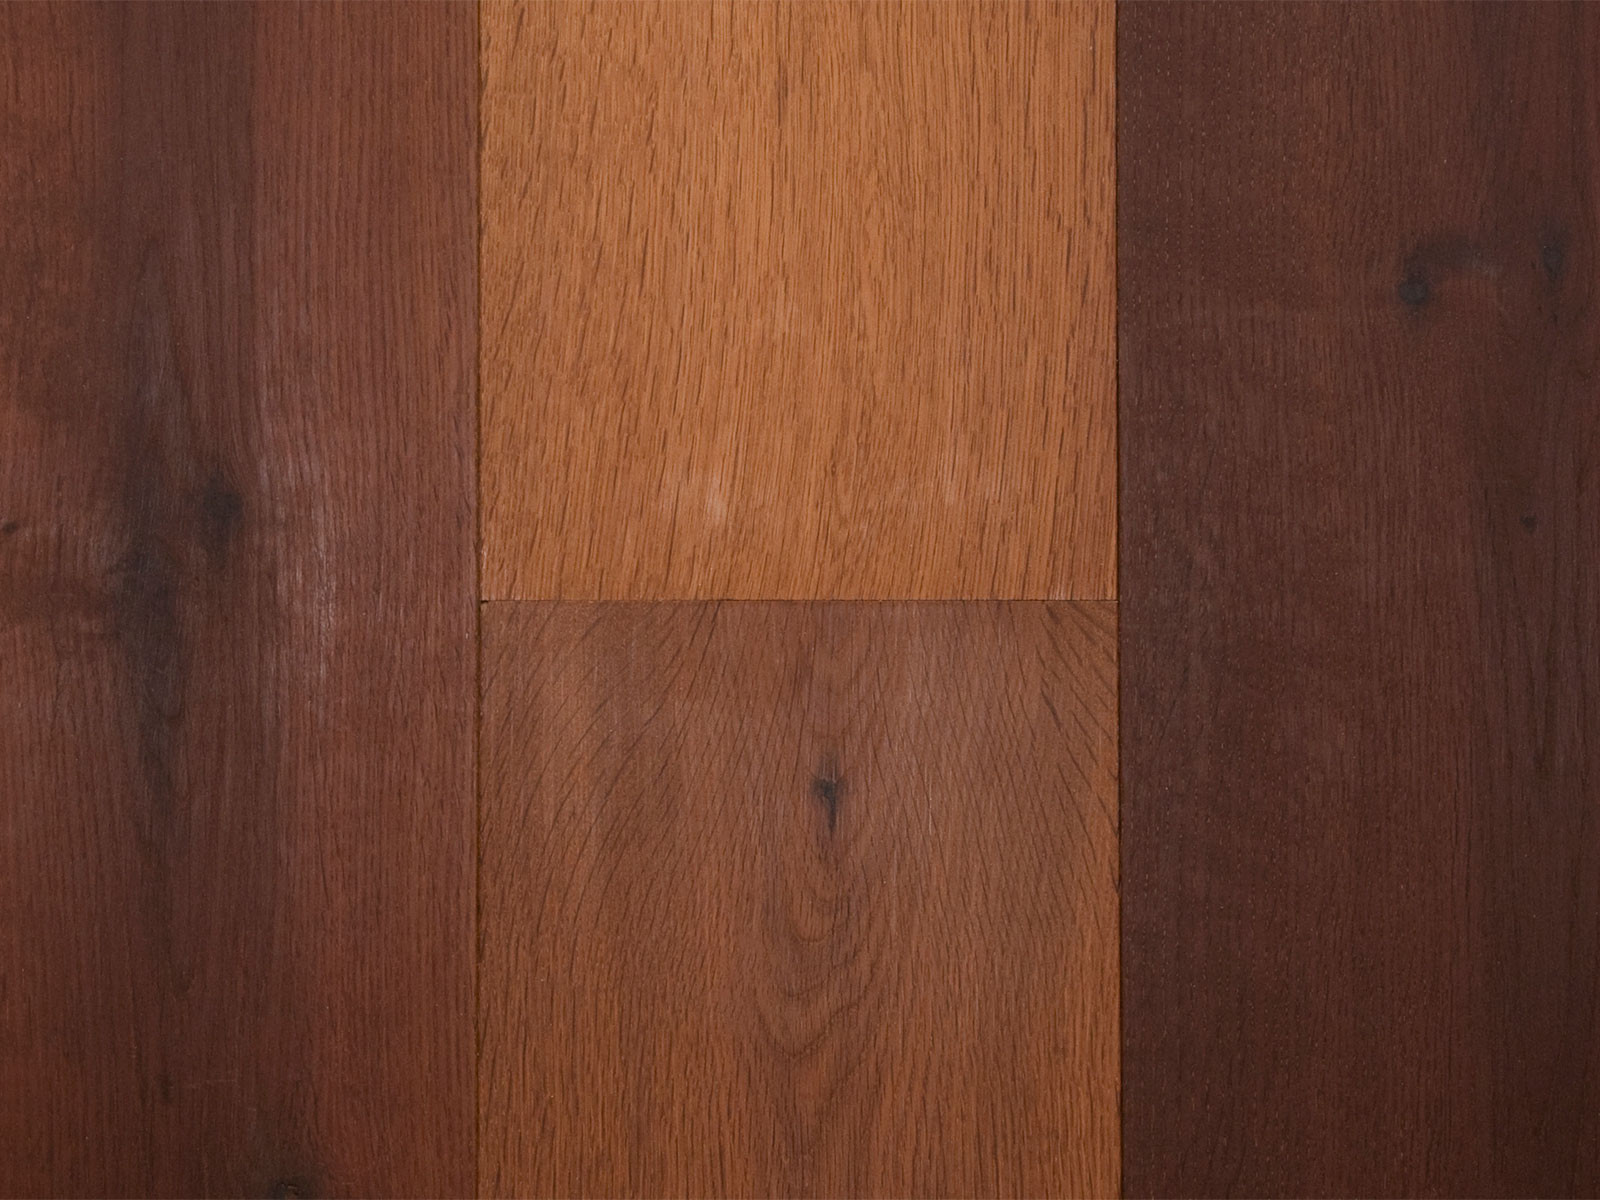 bruce armstrong engineered hardwood flooring of provenza hardwood flooring houston tx discount premium wood floors for savoy european oak